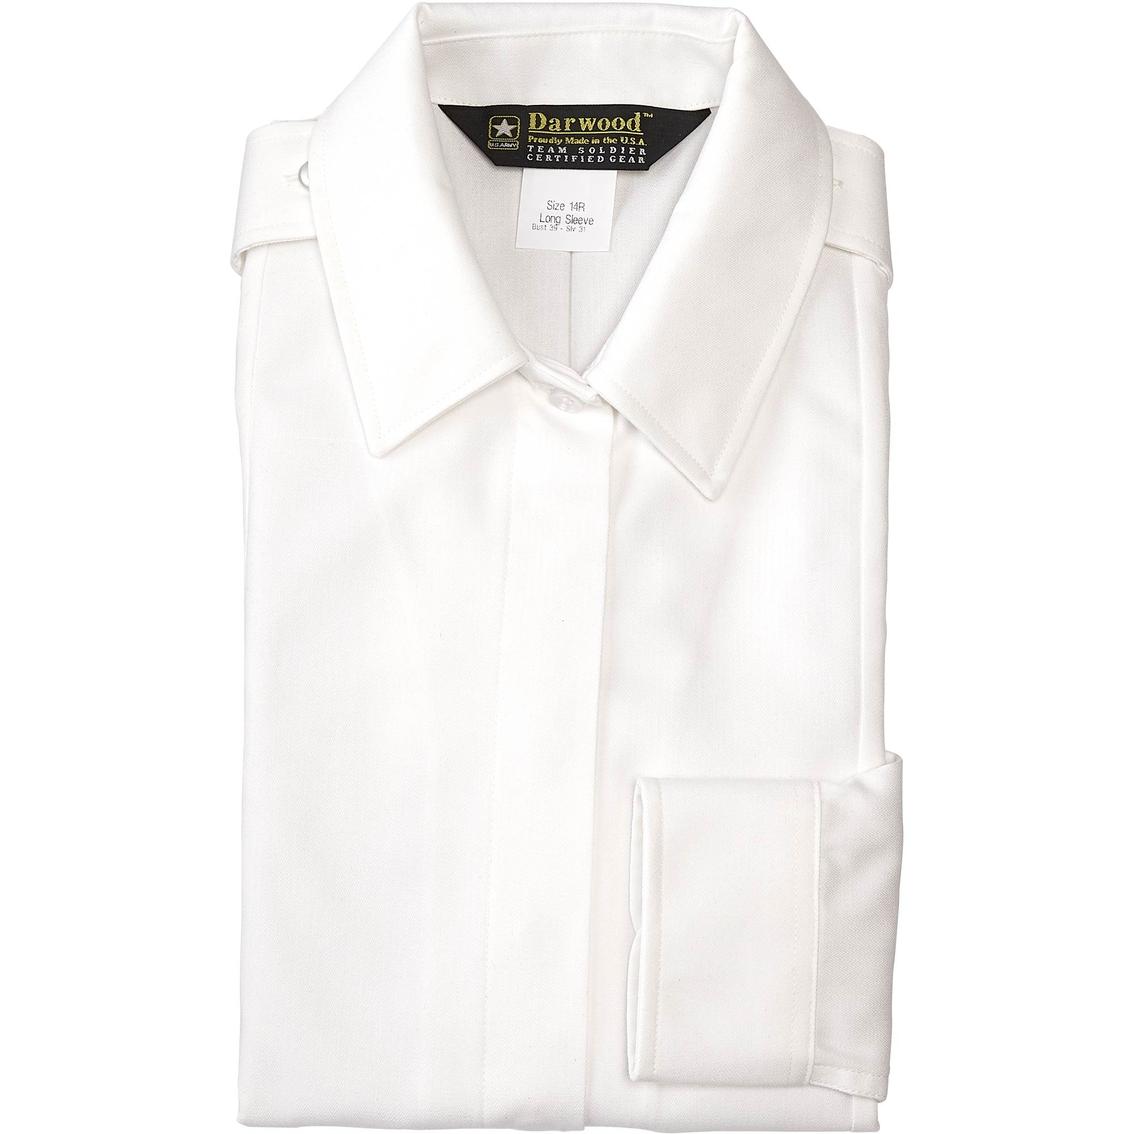 b58f2c0f Army Women's White Placket Long Sleeve Blouse (asu)   Shirts ...